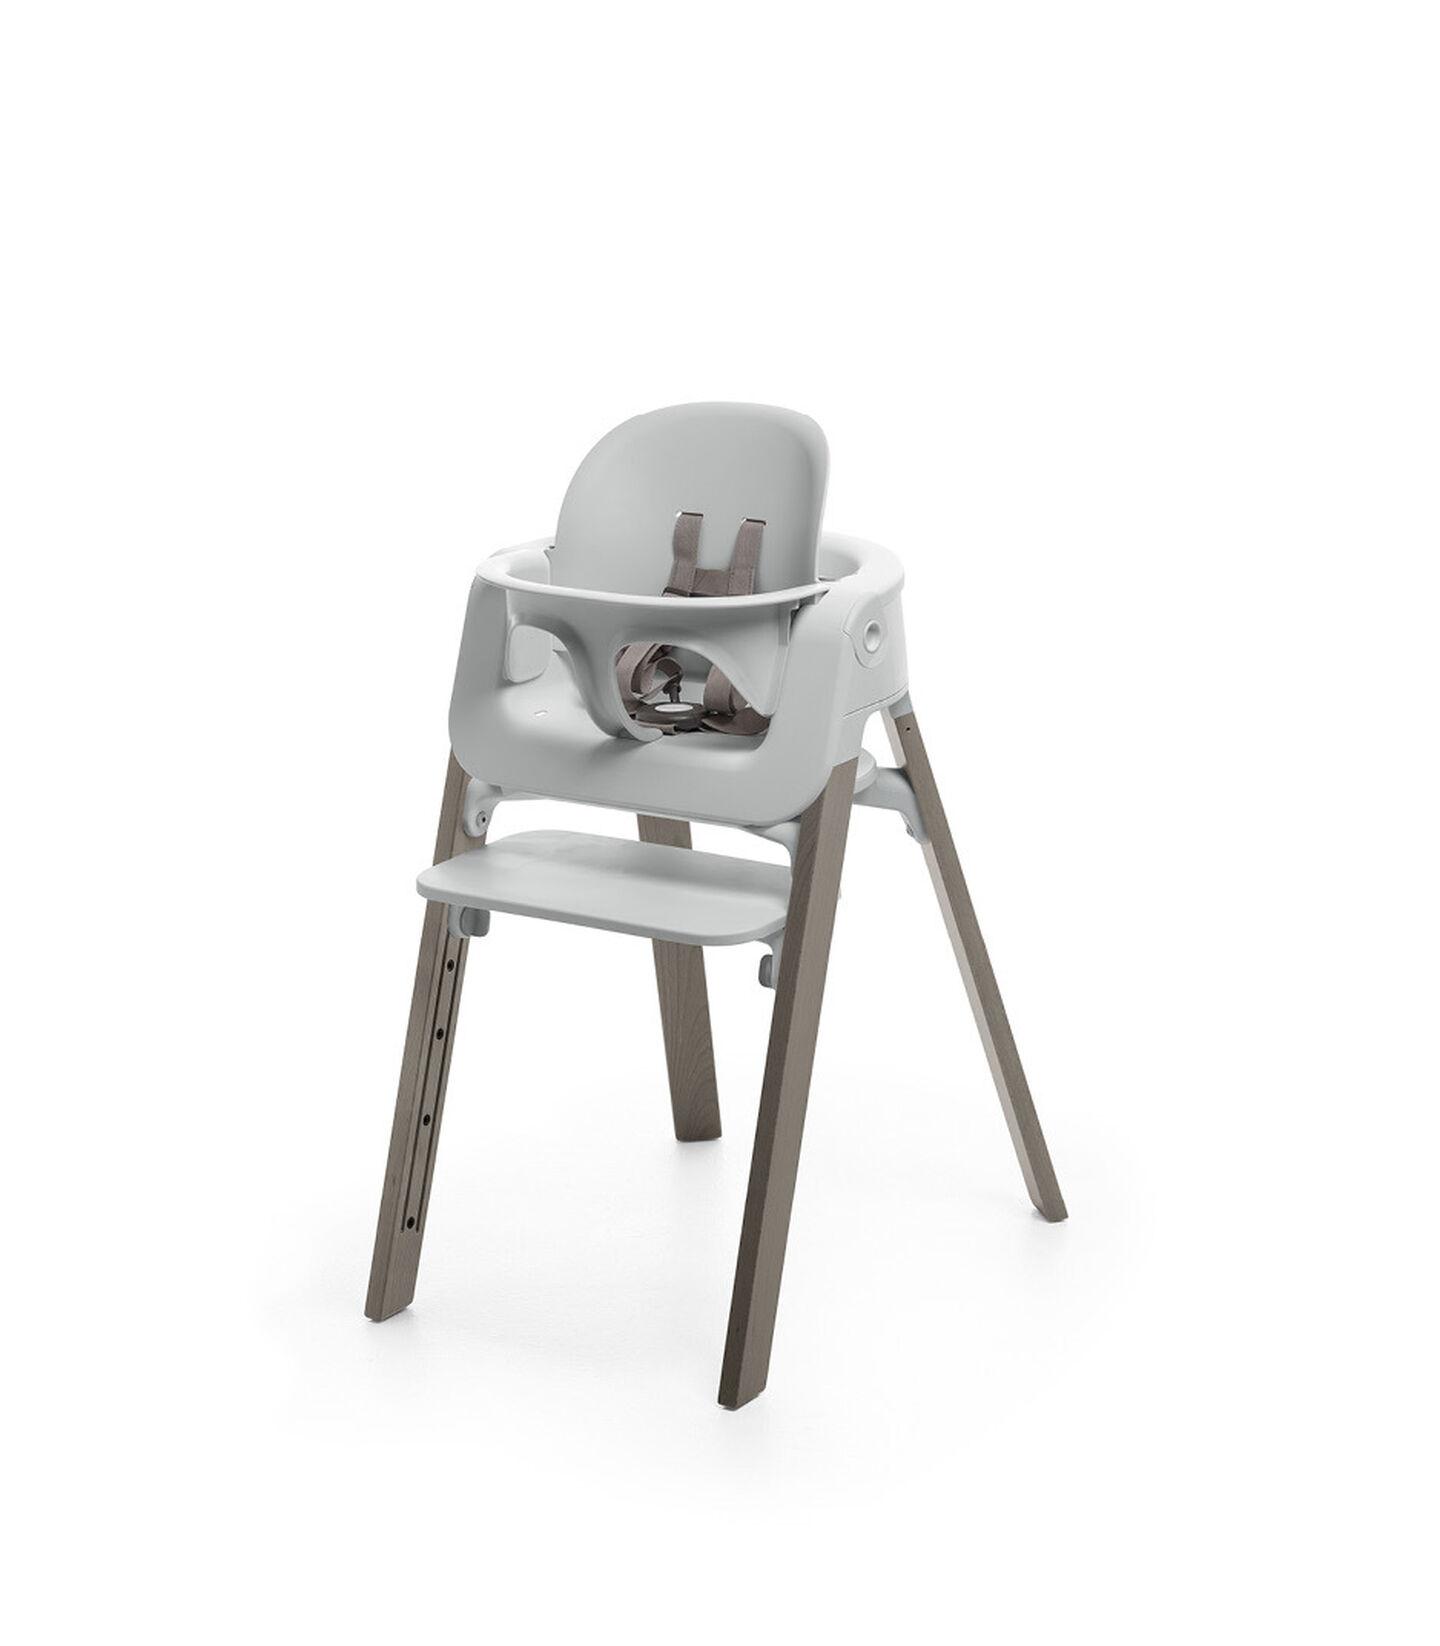 Stokke® Steps™ Hazy Grey chair with Baby Set Light Grey.